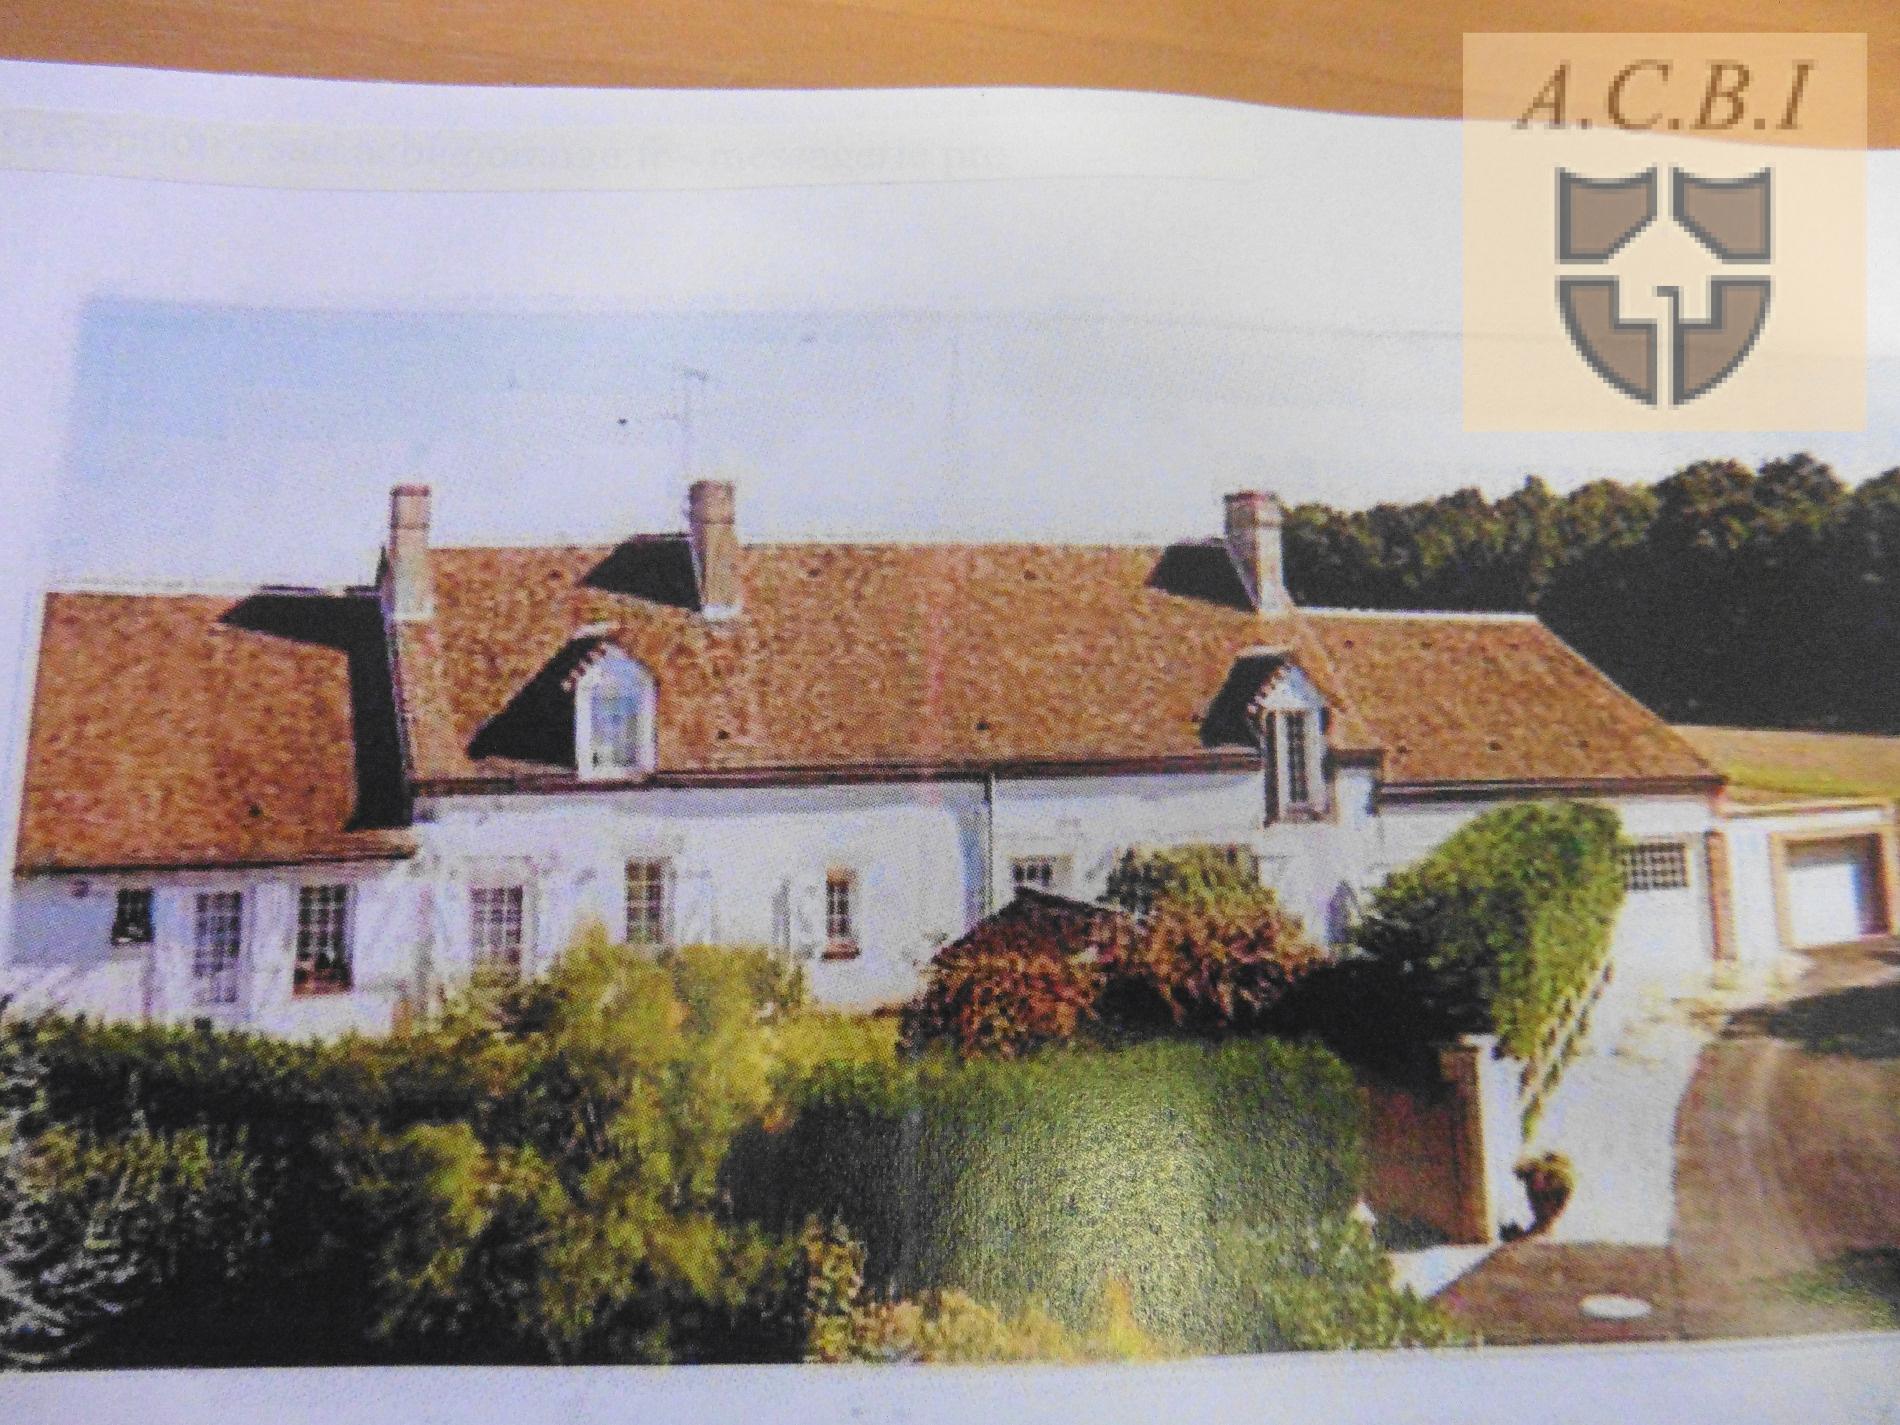 Vente 12 mn chateaudun sud jolie longere beaux volumes for Garage ad chateaudun